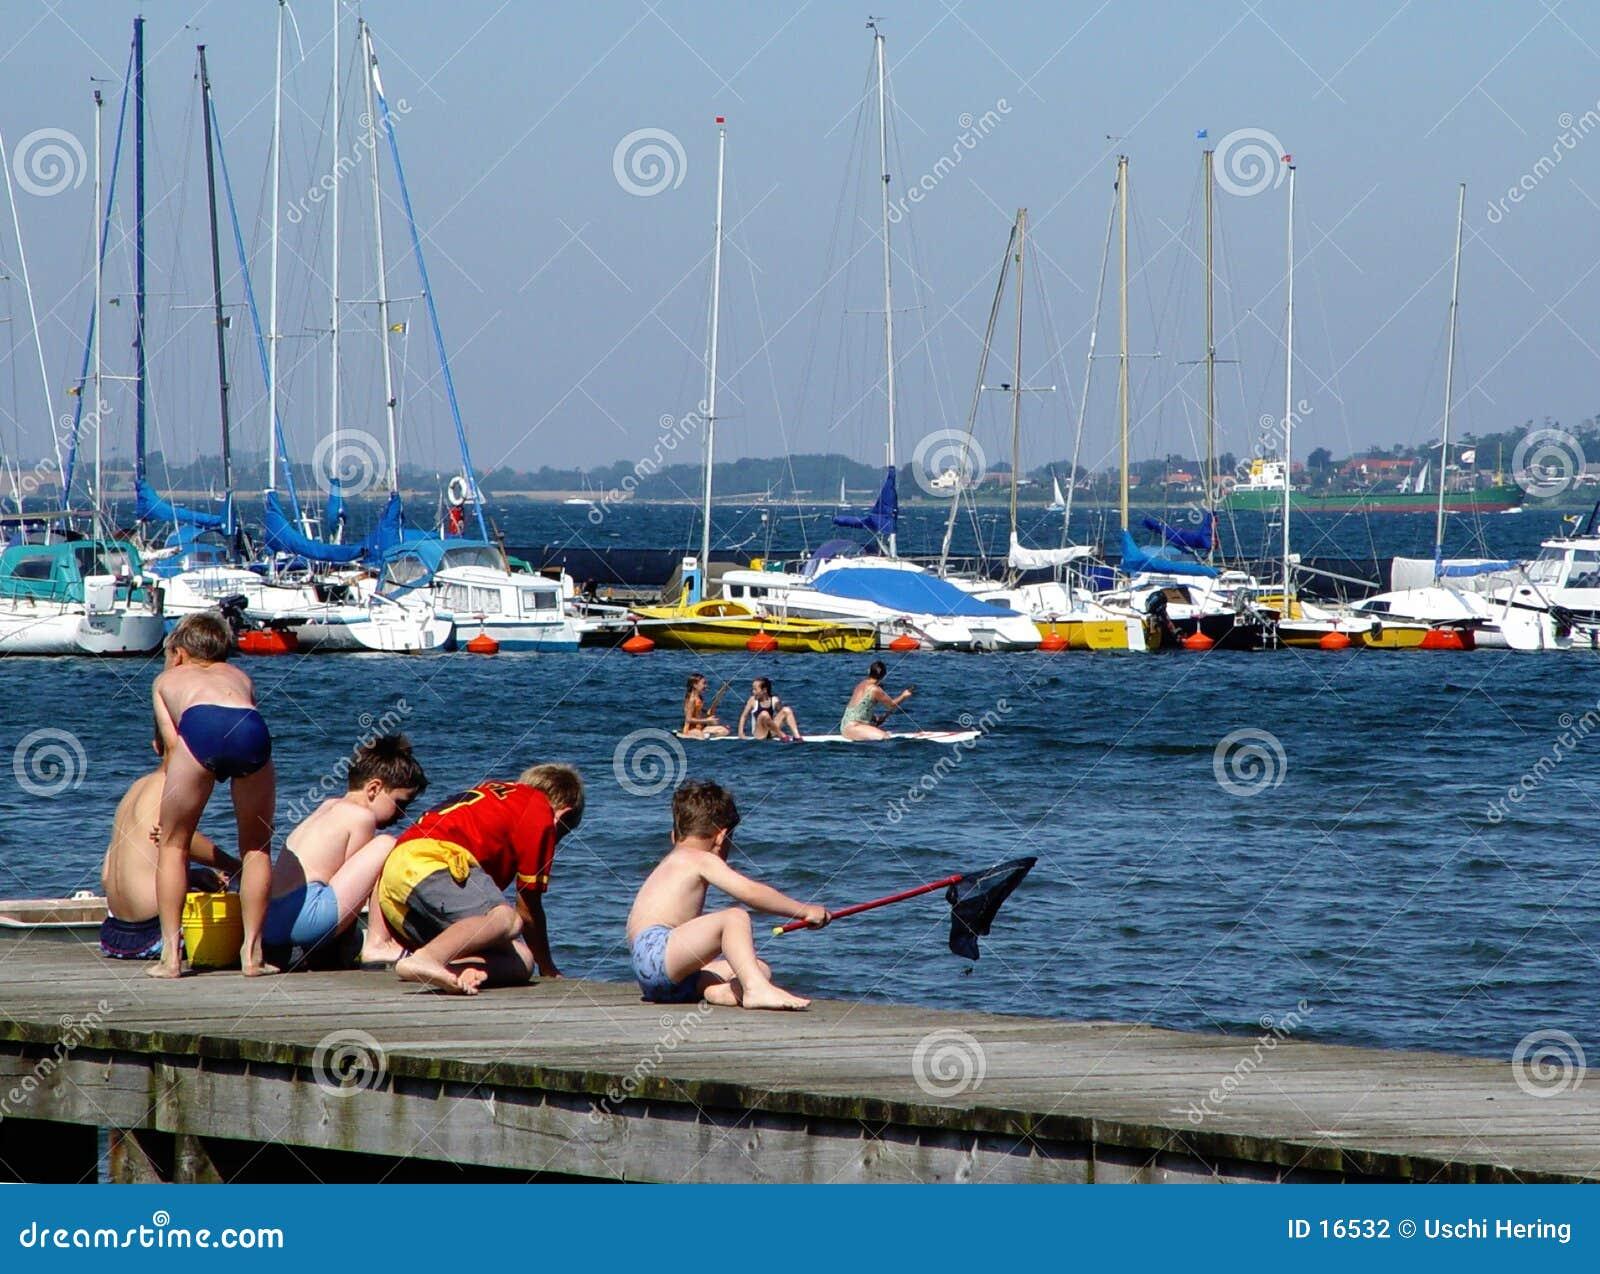 boys fishing on a pier